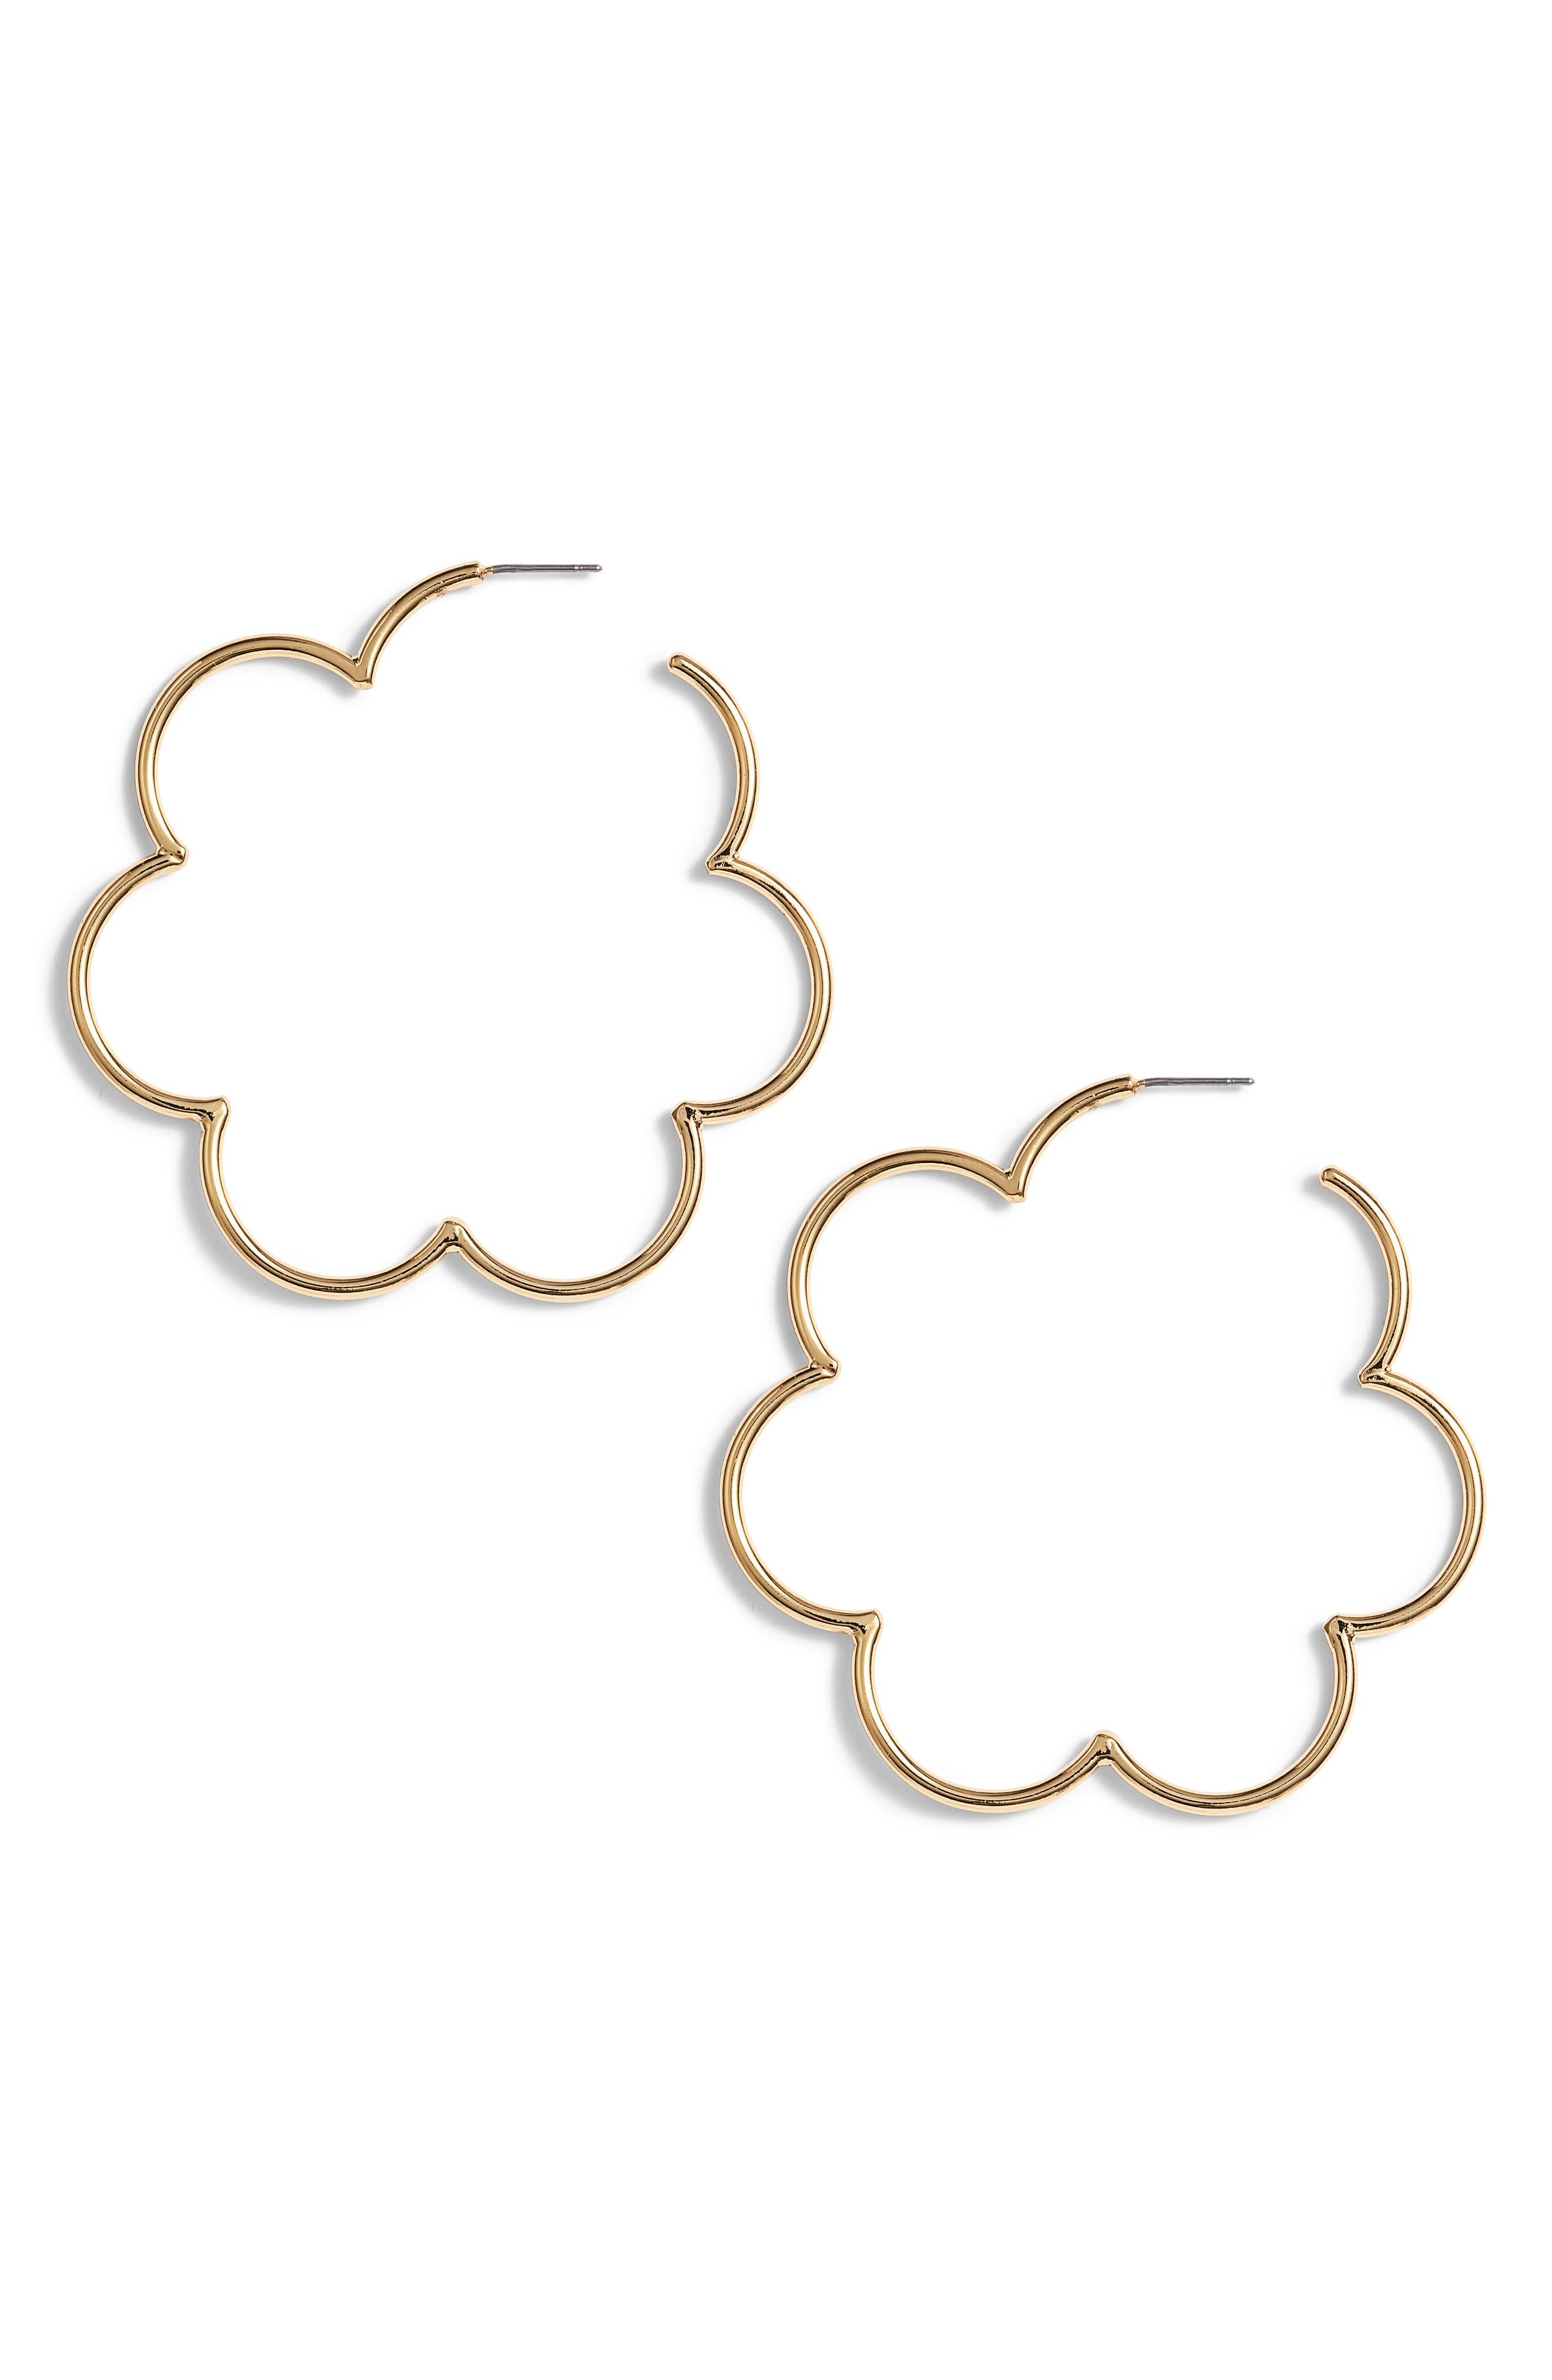 KATE SPADE NEW YORK scrunched scallops large hoop earrings, Main, color, 710